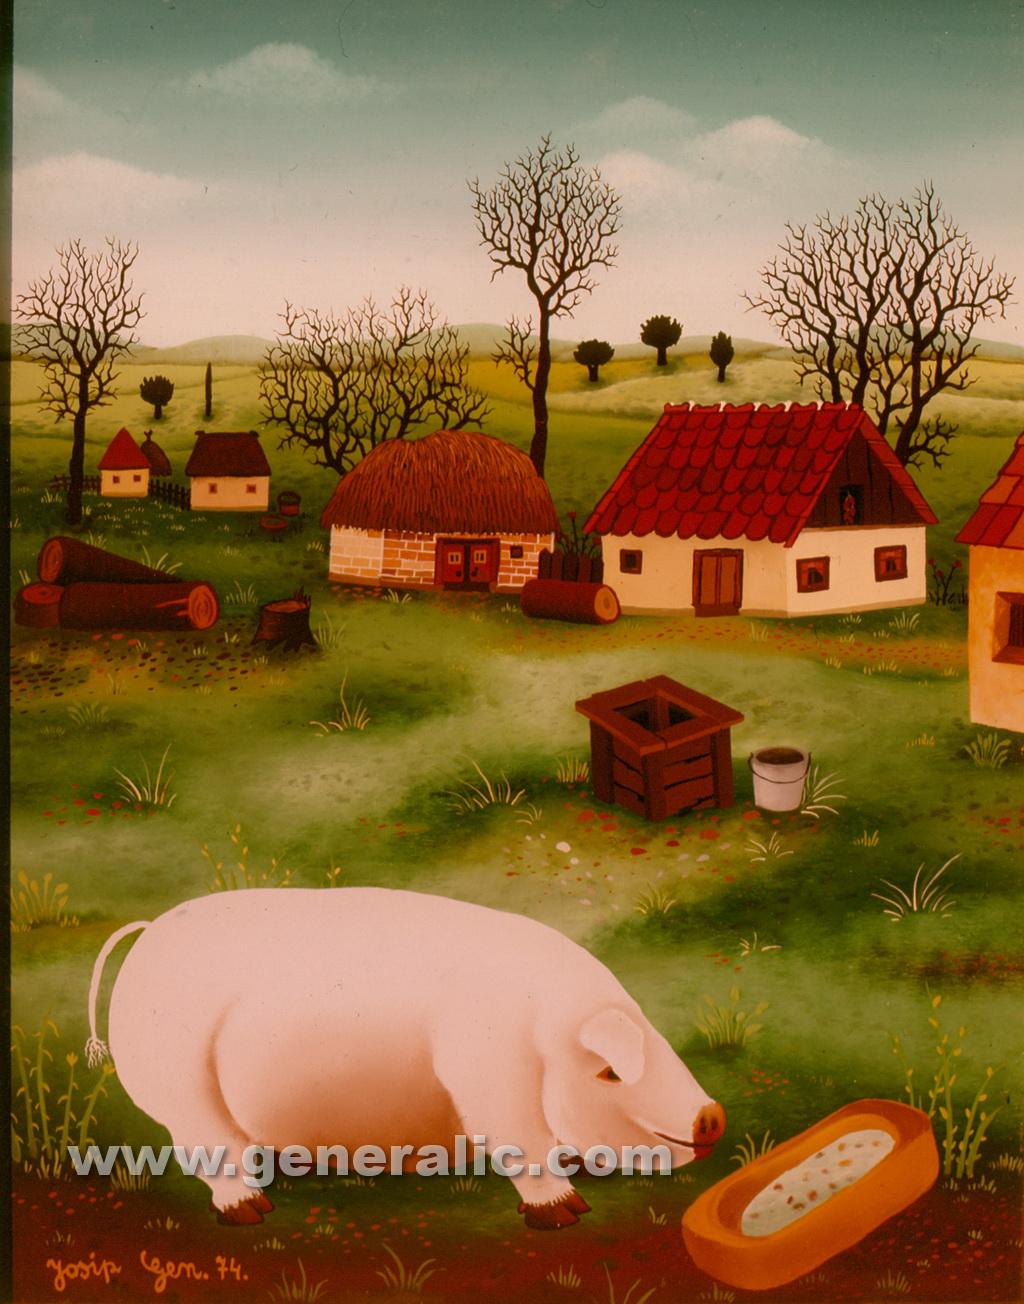 Josip Generalic, 1974, Pig is eating, oil on glass